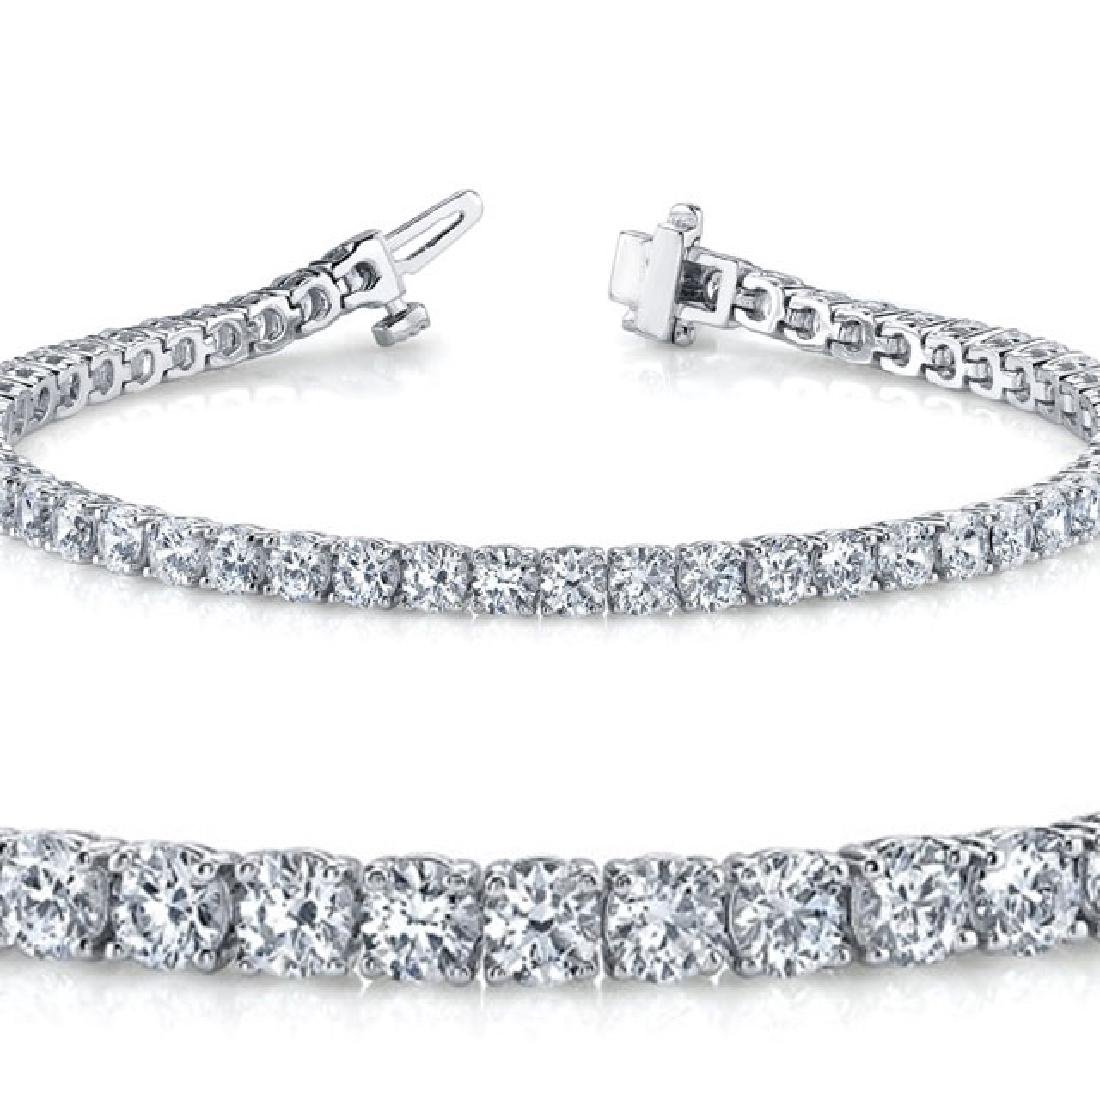 4ct VS-SI Diamond Tennis Bracelet Platinum